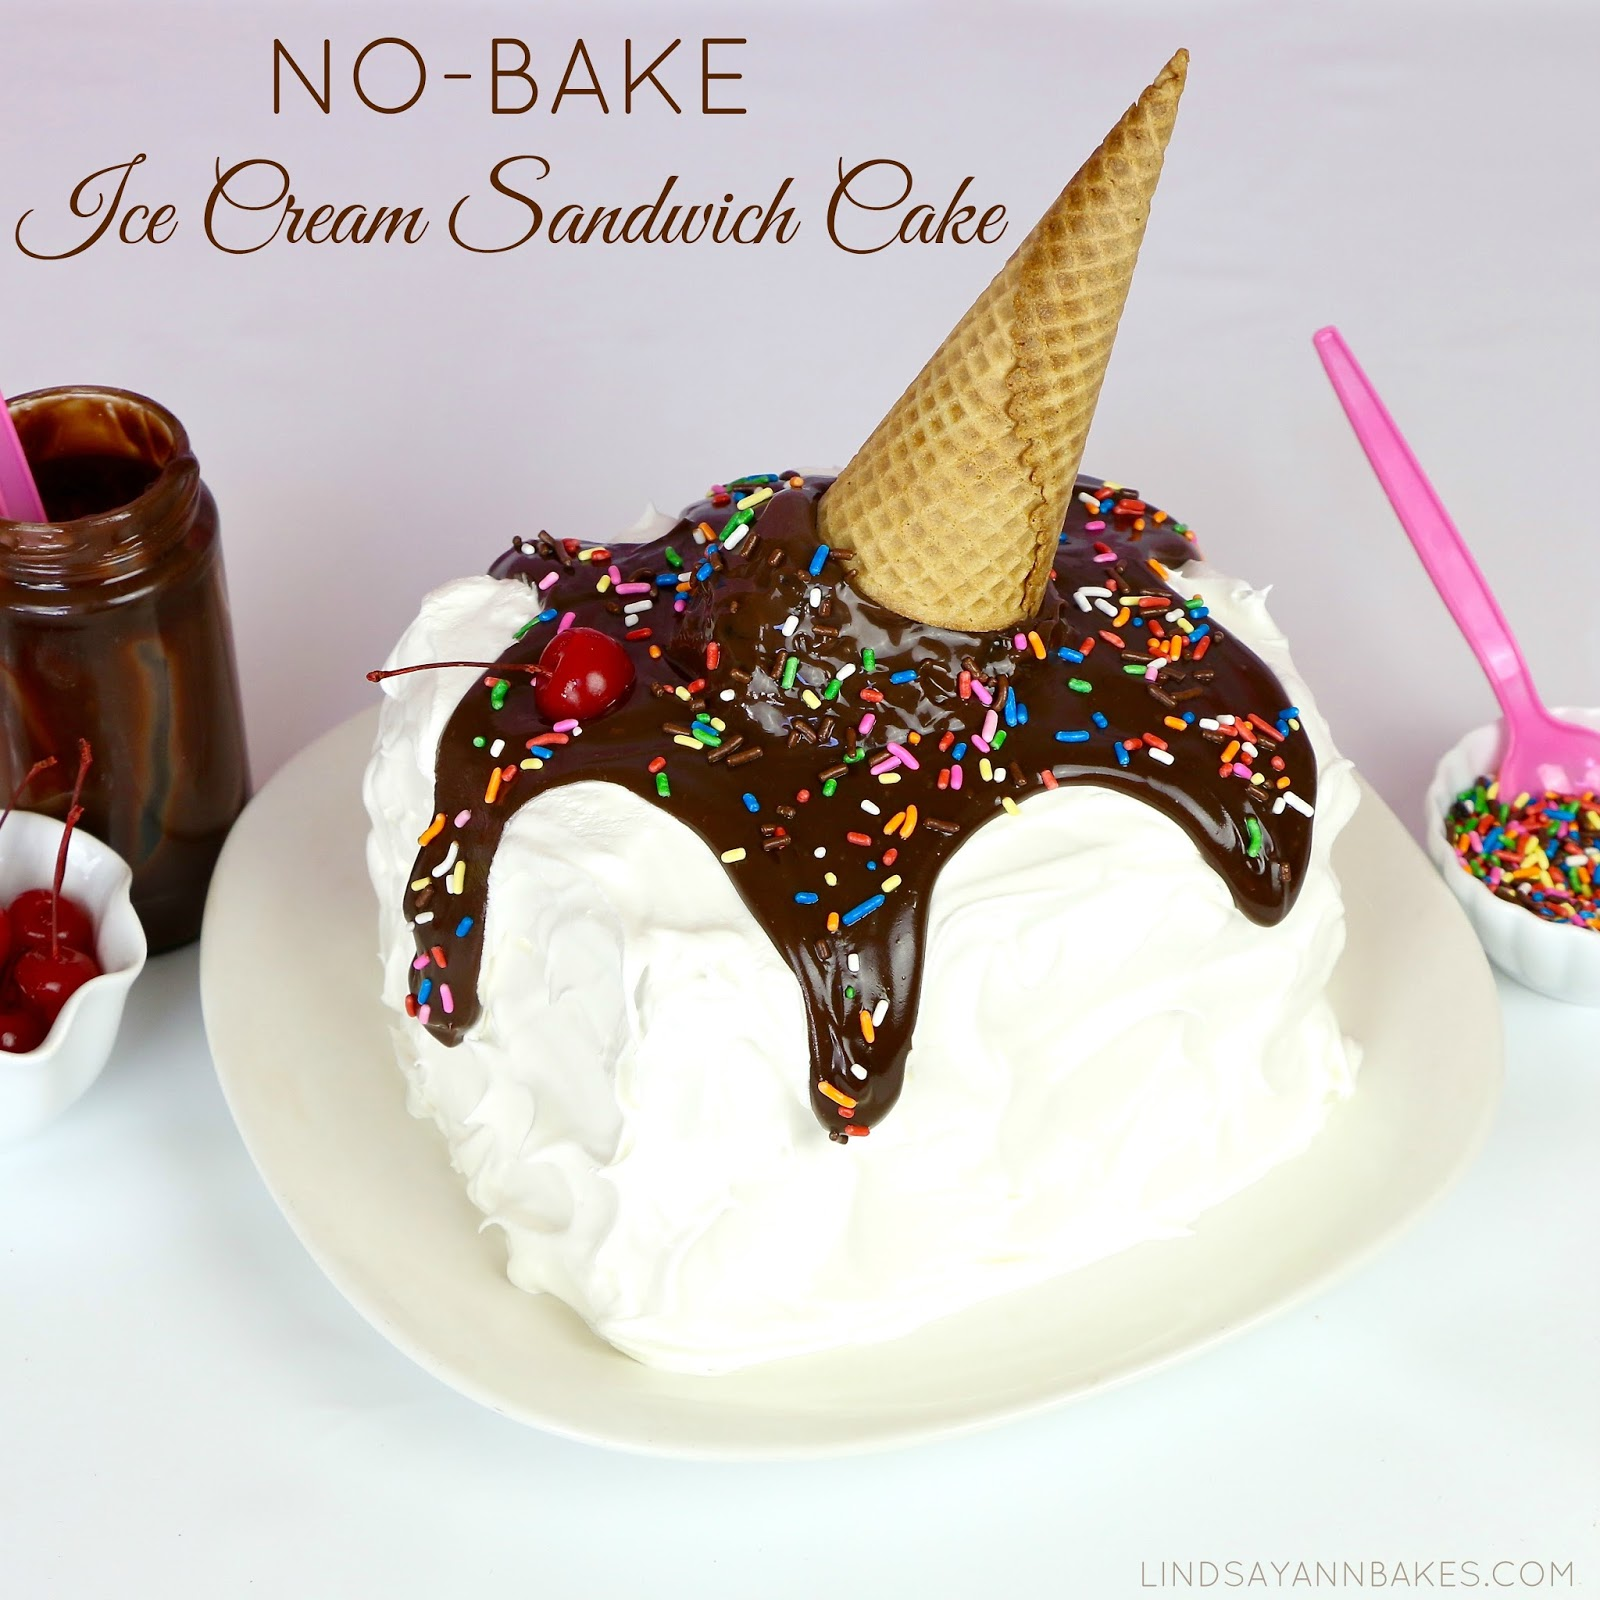 Make Icecream Cake Using Ice Cream Sandwiches